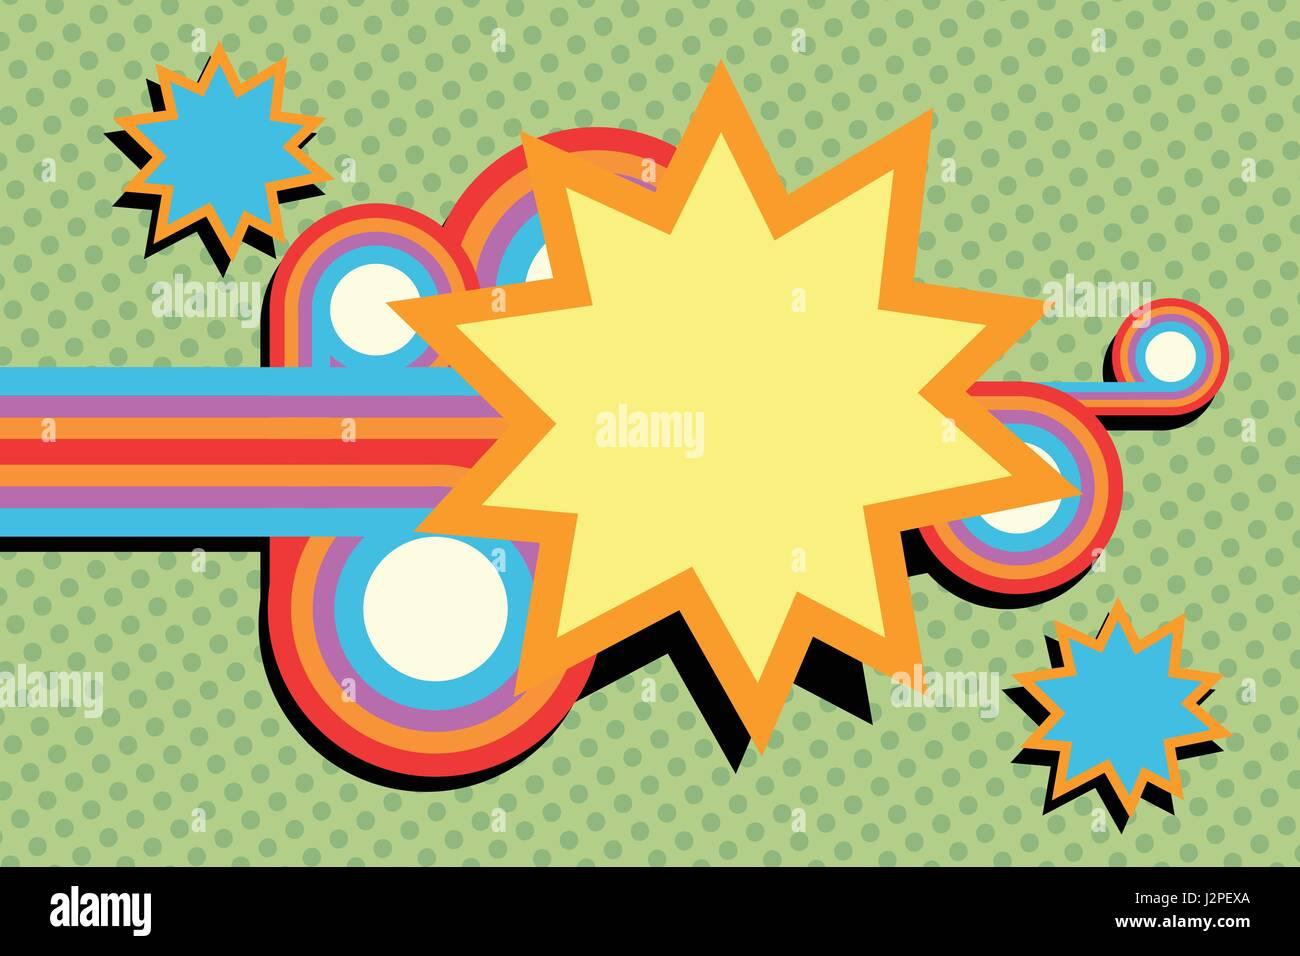 pop art swirls abstract - Stock Image